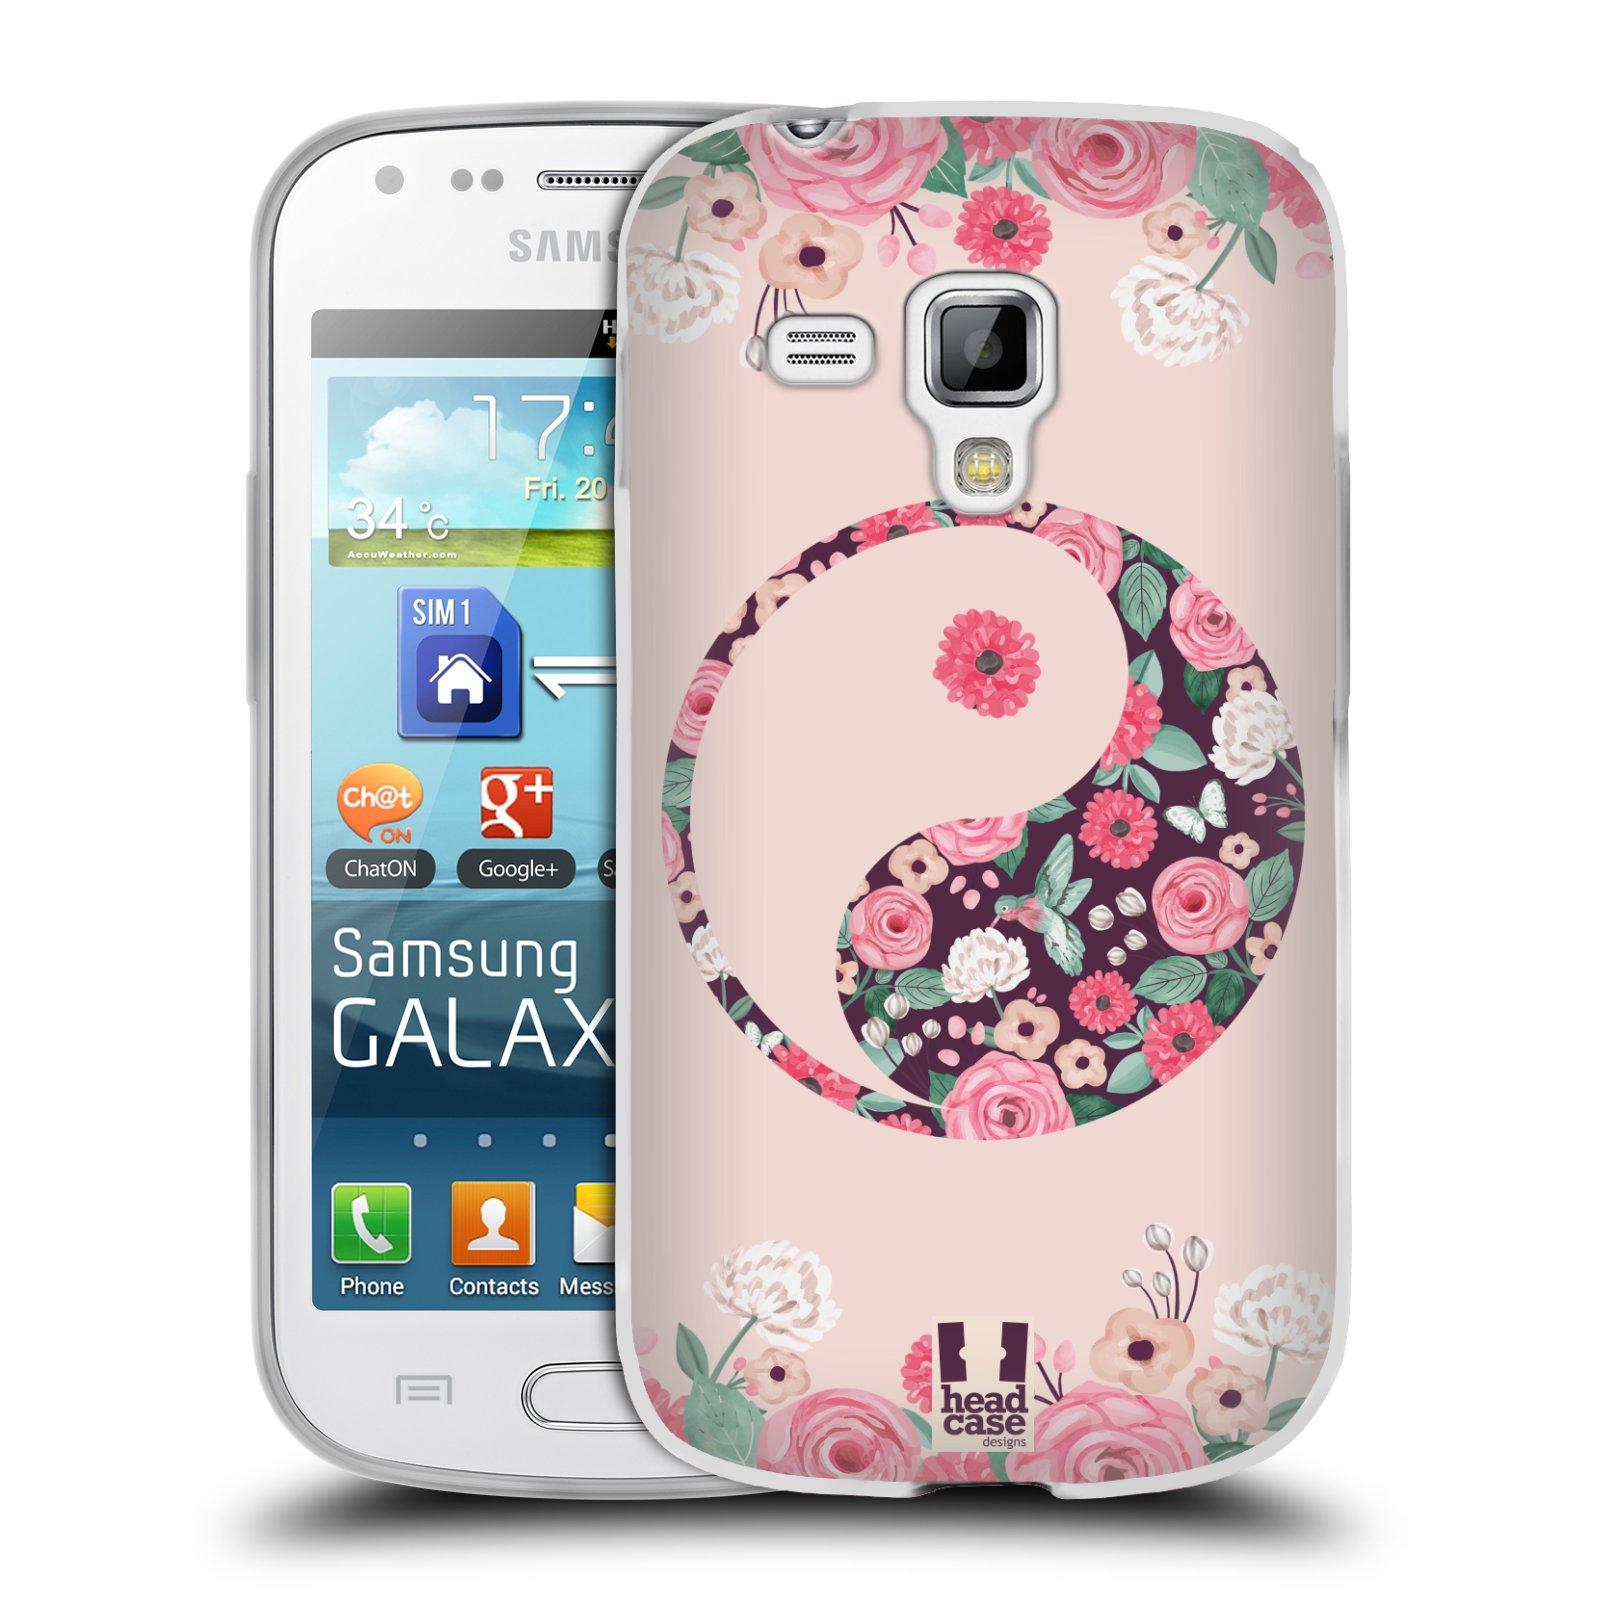 Silikonové pouzdro na mobil Samsung Galaxy S Duos HEAD CASE Yin a Yang Floral (Silikonový kryt či obal na mobilní telefon Samsung Galaxy S Duos GT-S7562)